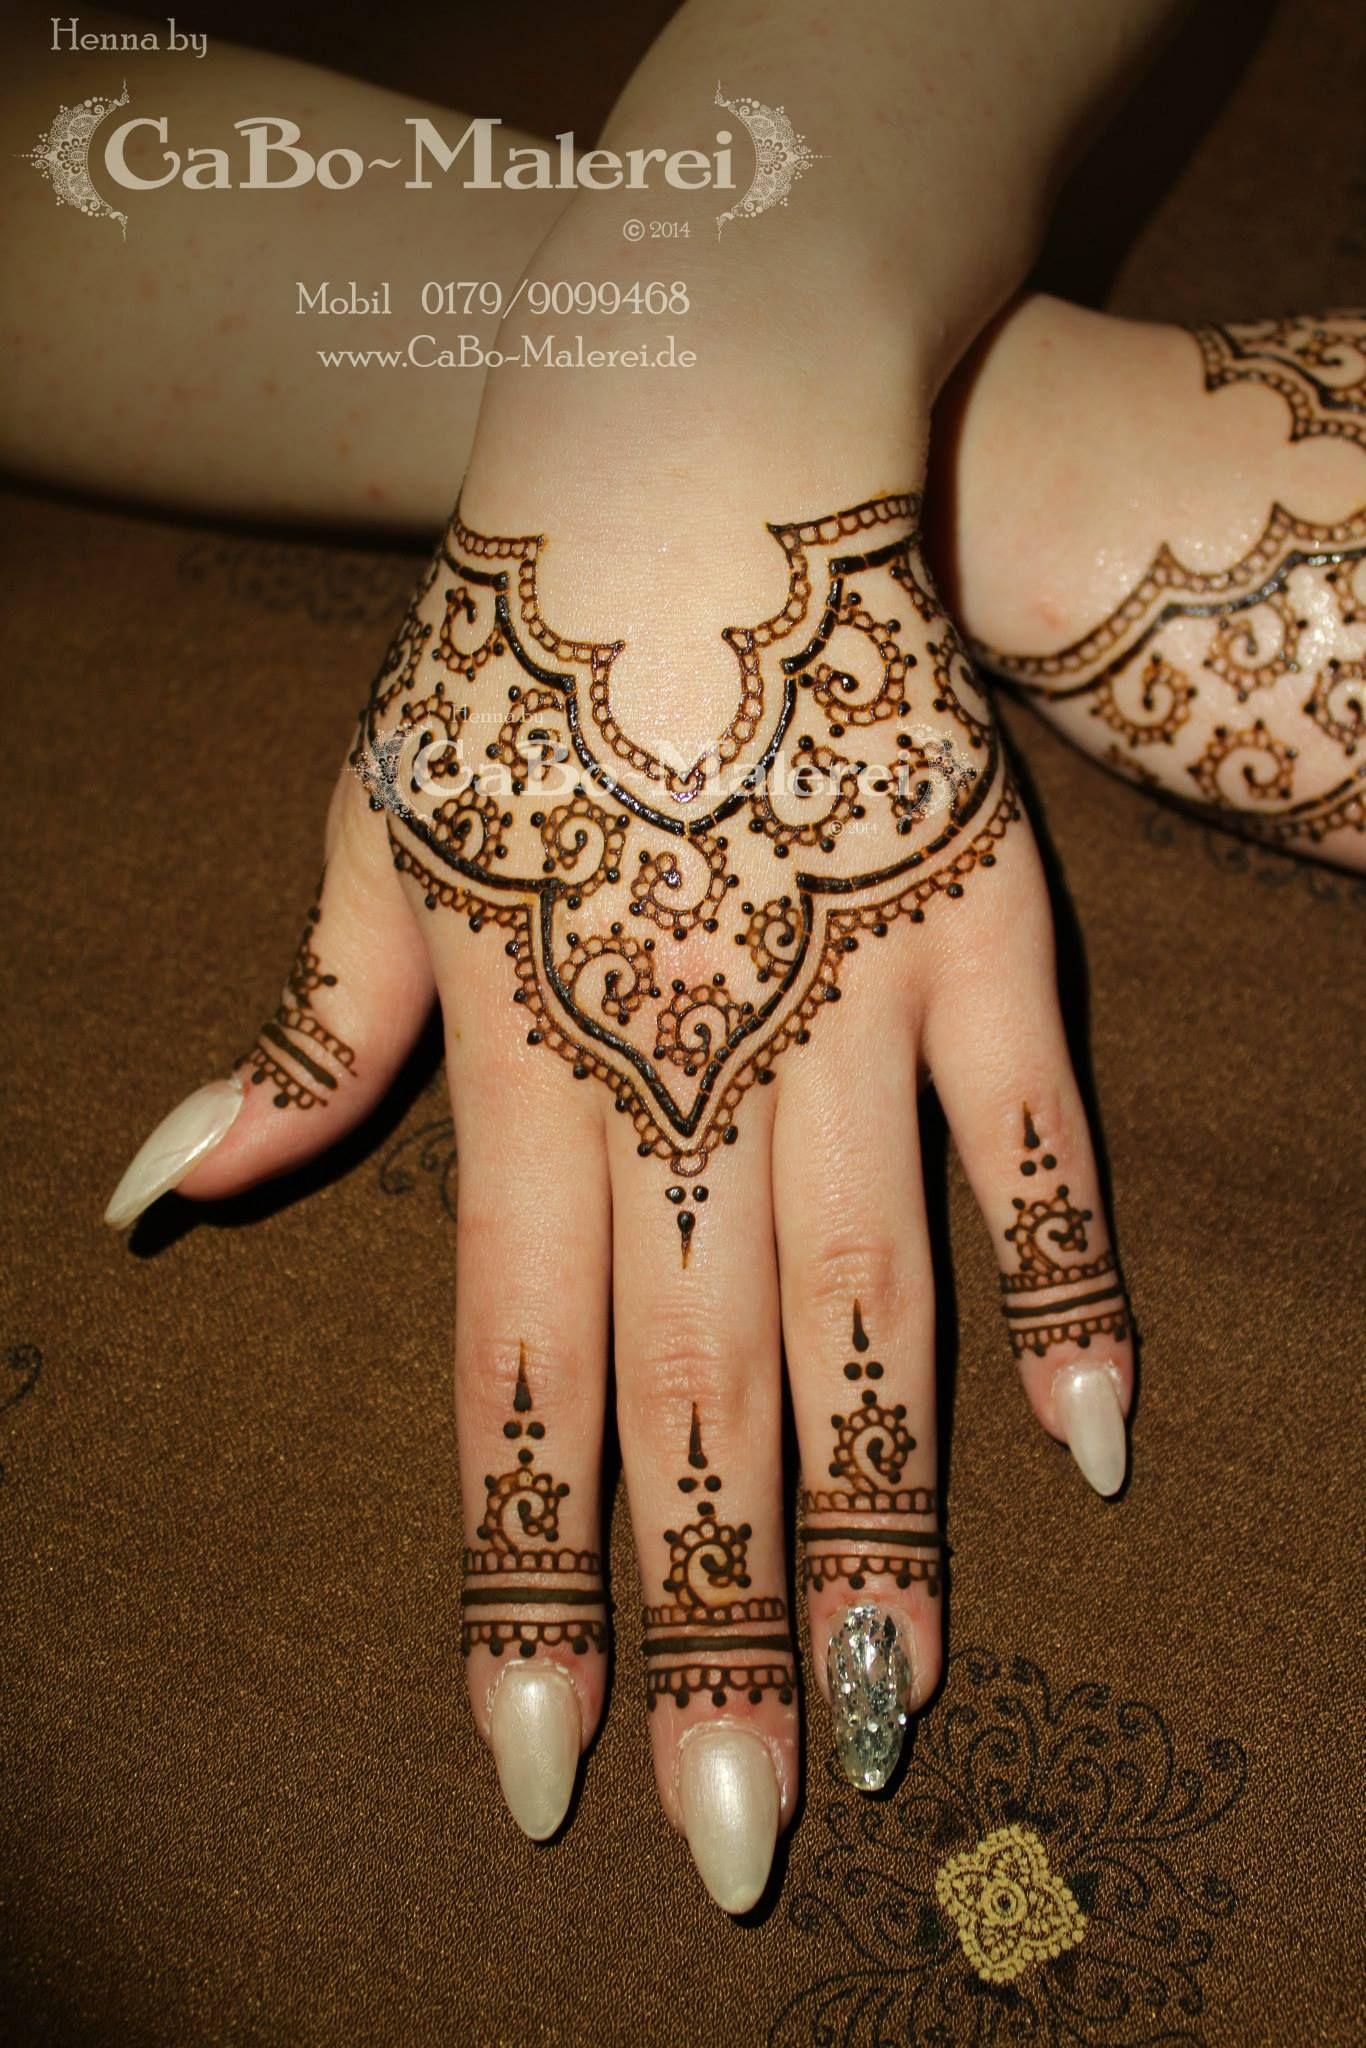 Henna Tattoo Hand Amazon: Simple Modern #Henna By CaBo-Malerei.